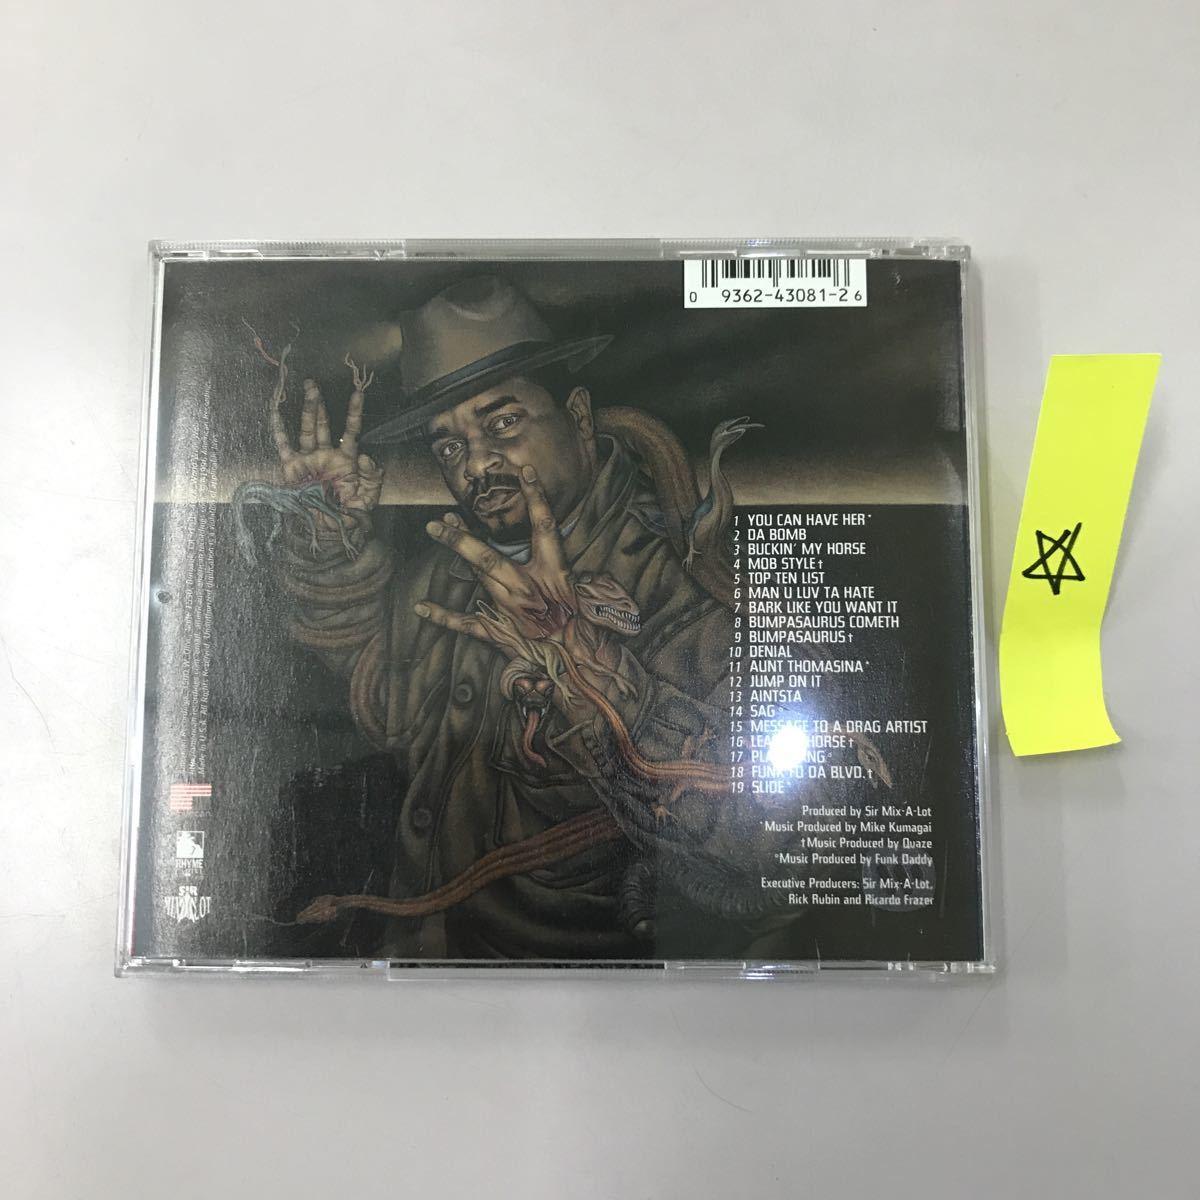 CD 輸入盤 中古【洋楽】長期保存品 SIR MIX A LOT RETURN OF THE BUMPASAURUS